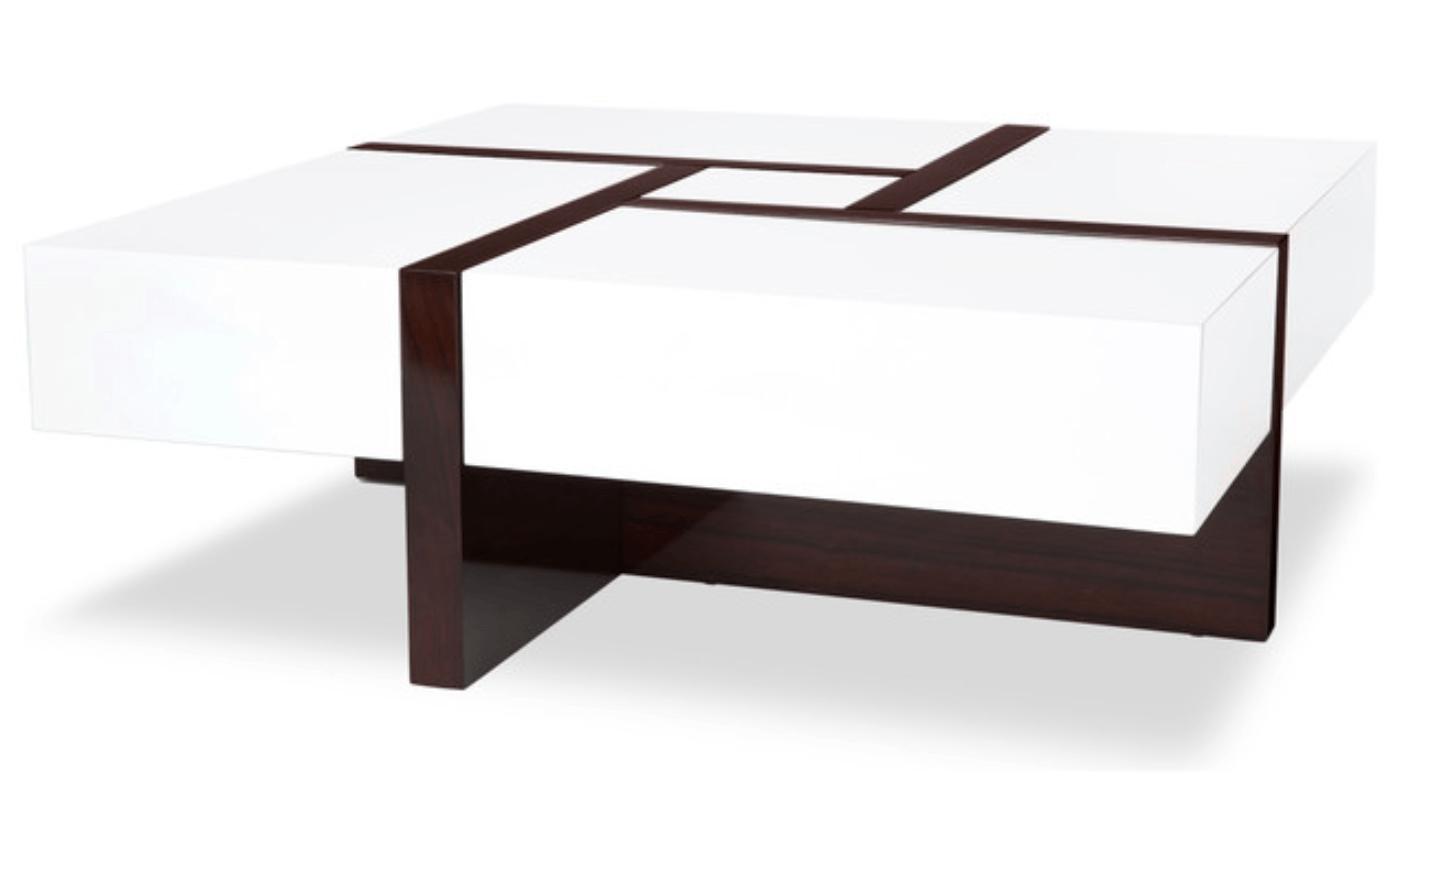 mcintosh-high-gloss-coffee-table-with-storage